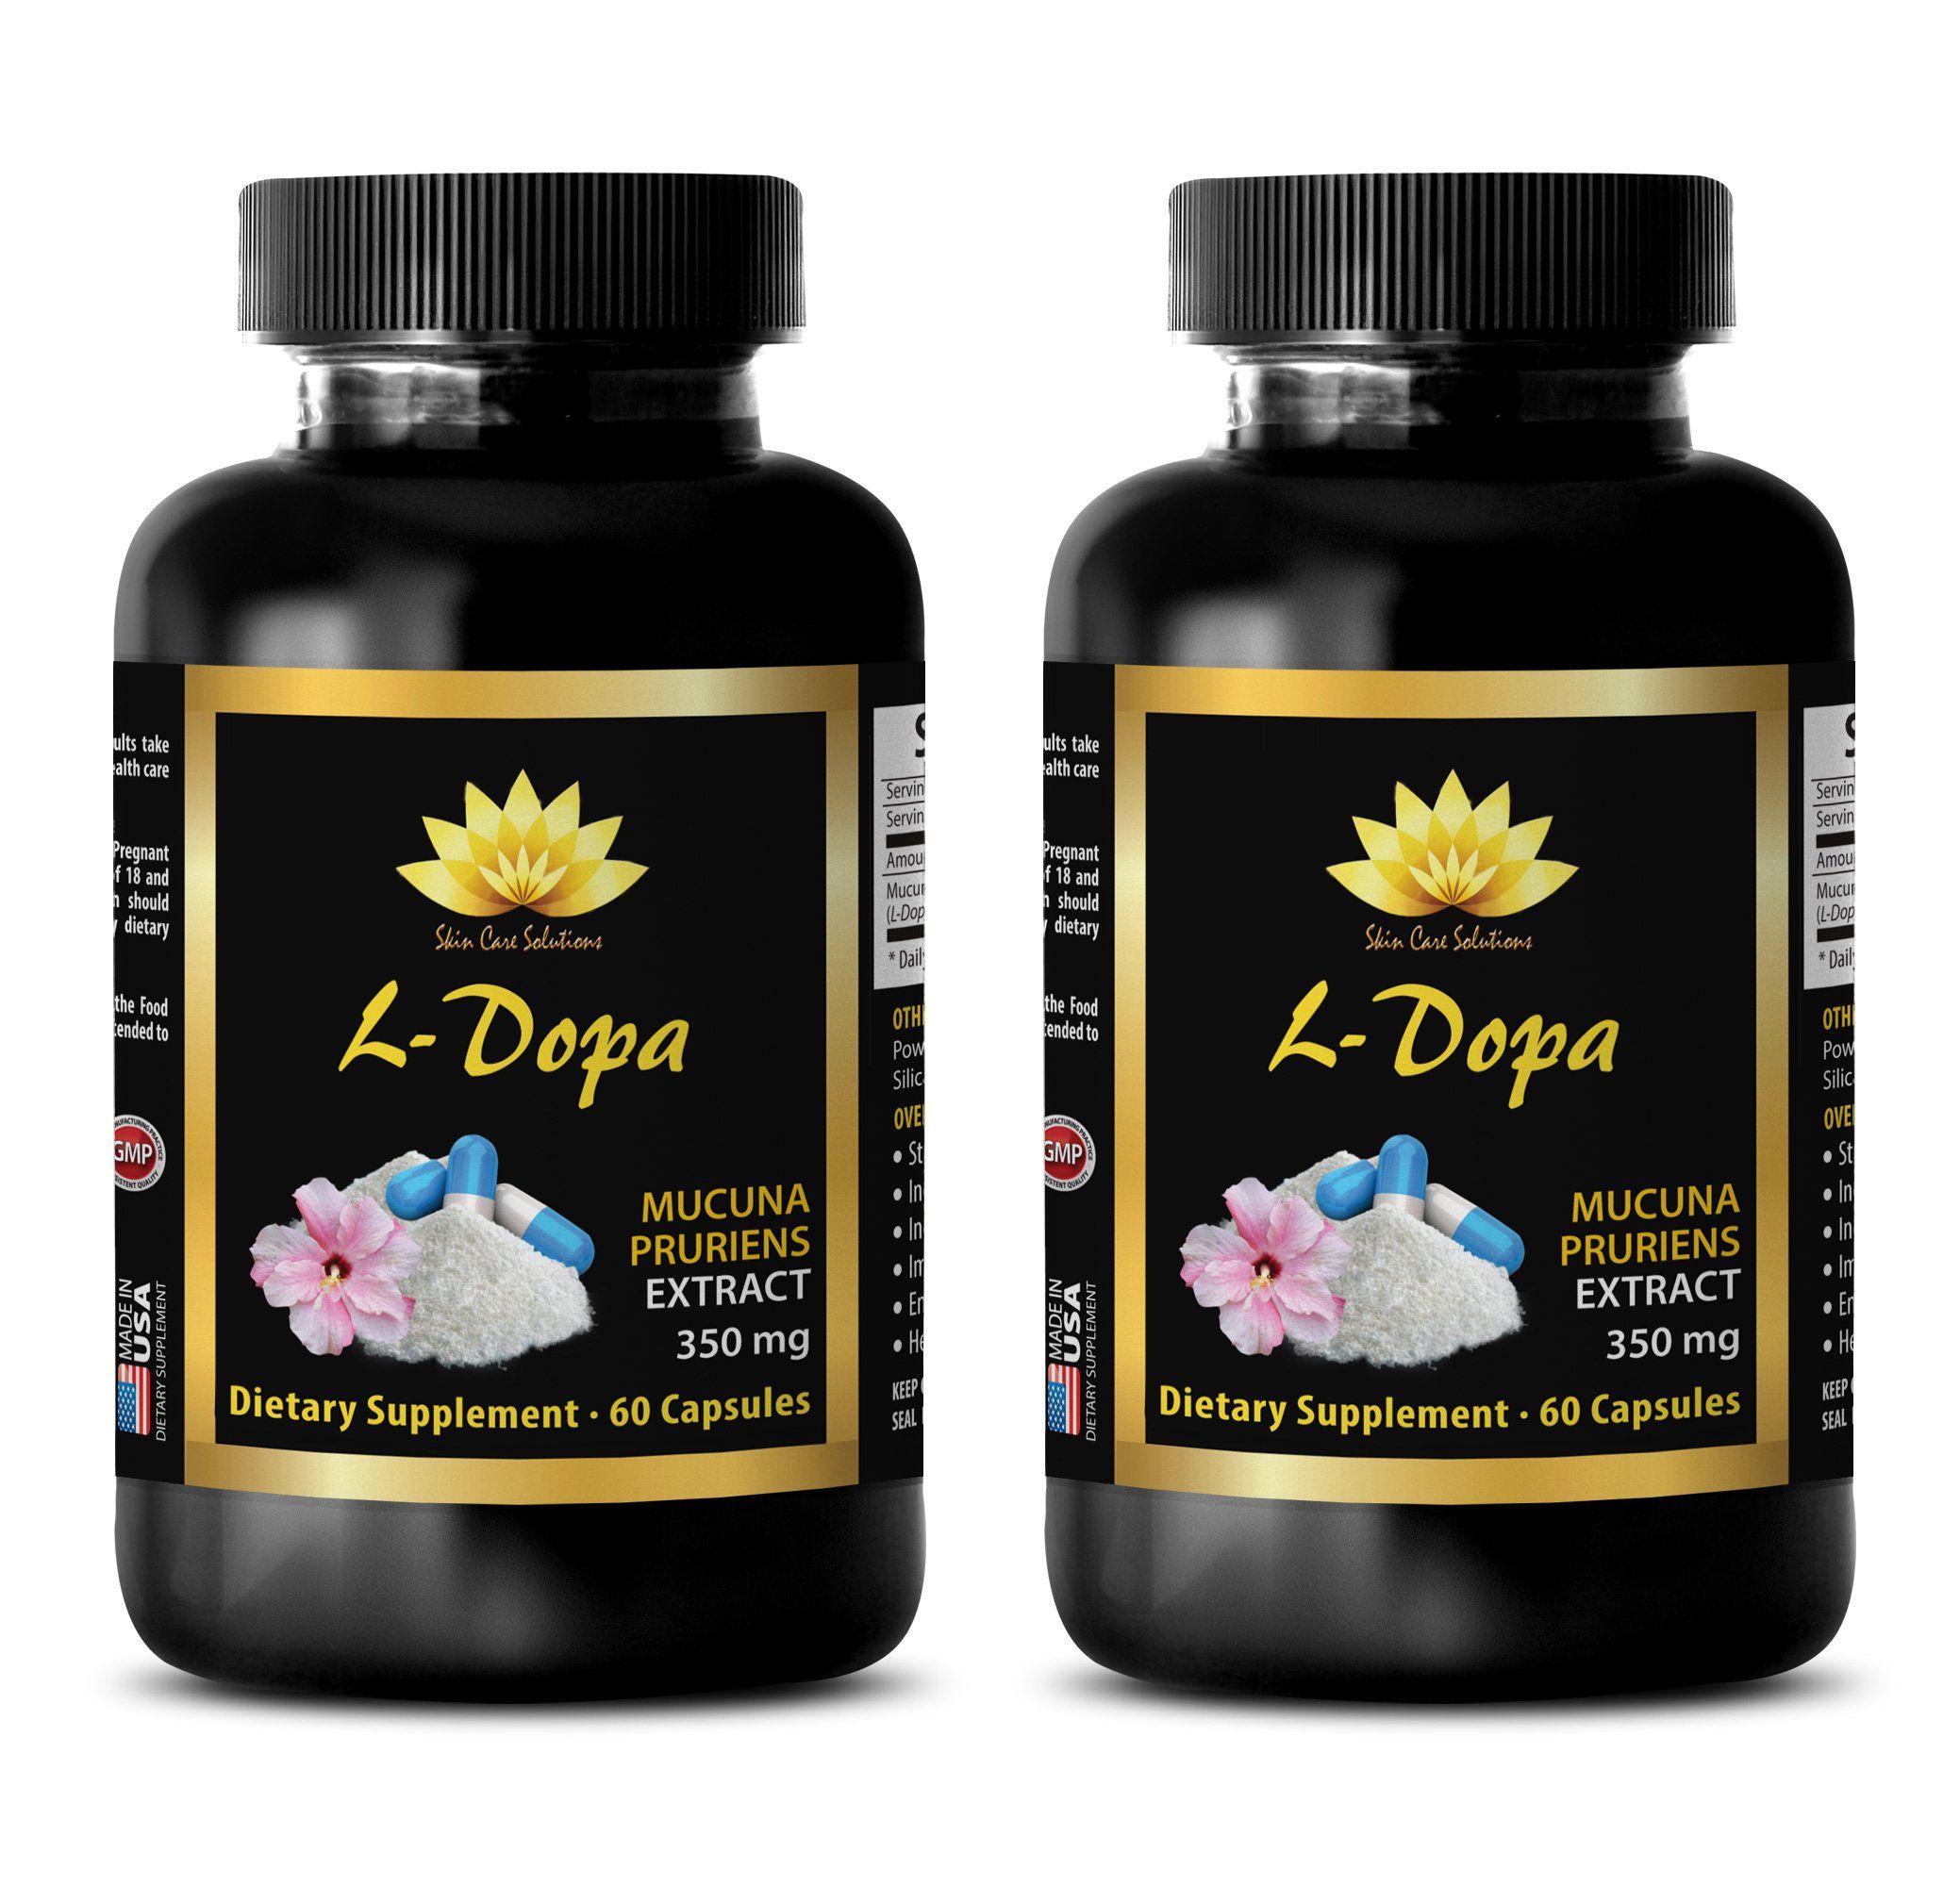 Pin on Libido Supplement for Women